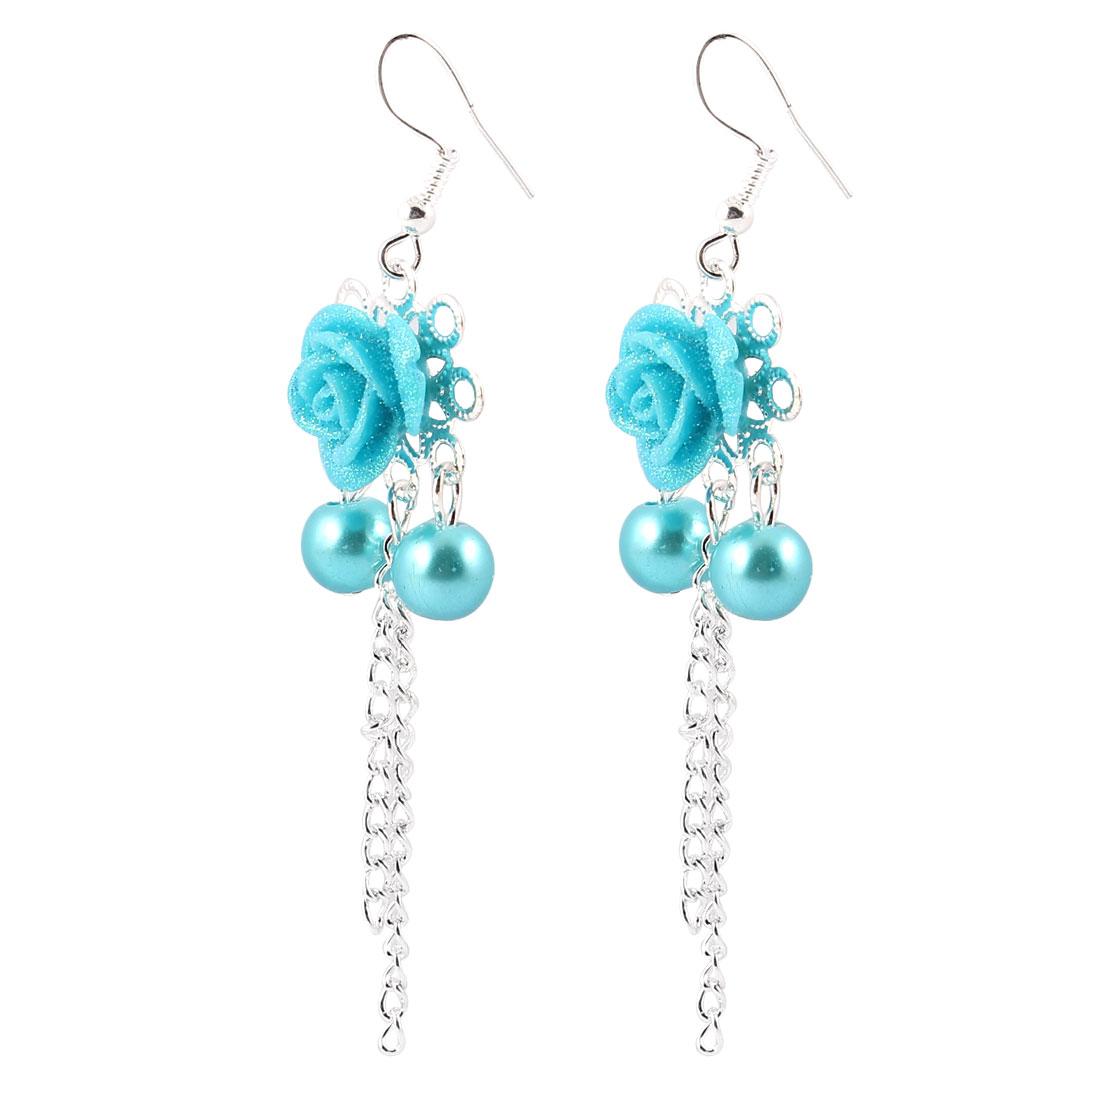 Pair Teal Blue Rose Cherry Shaped Pendant Fish Hook Earrings for Women